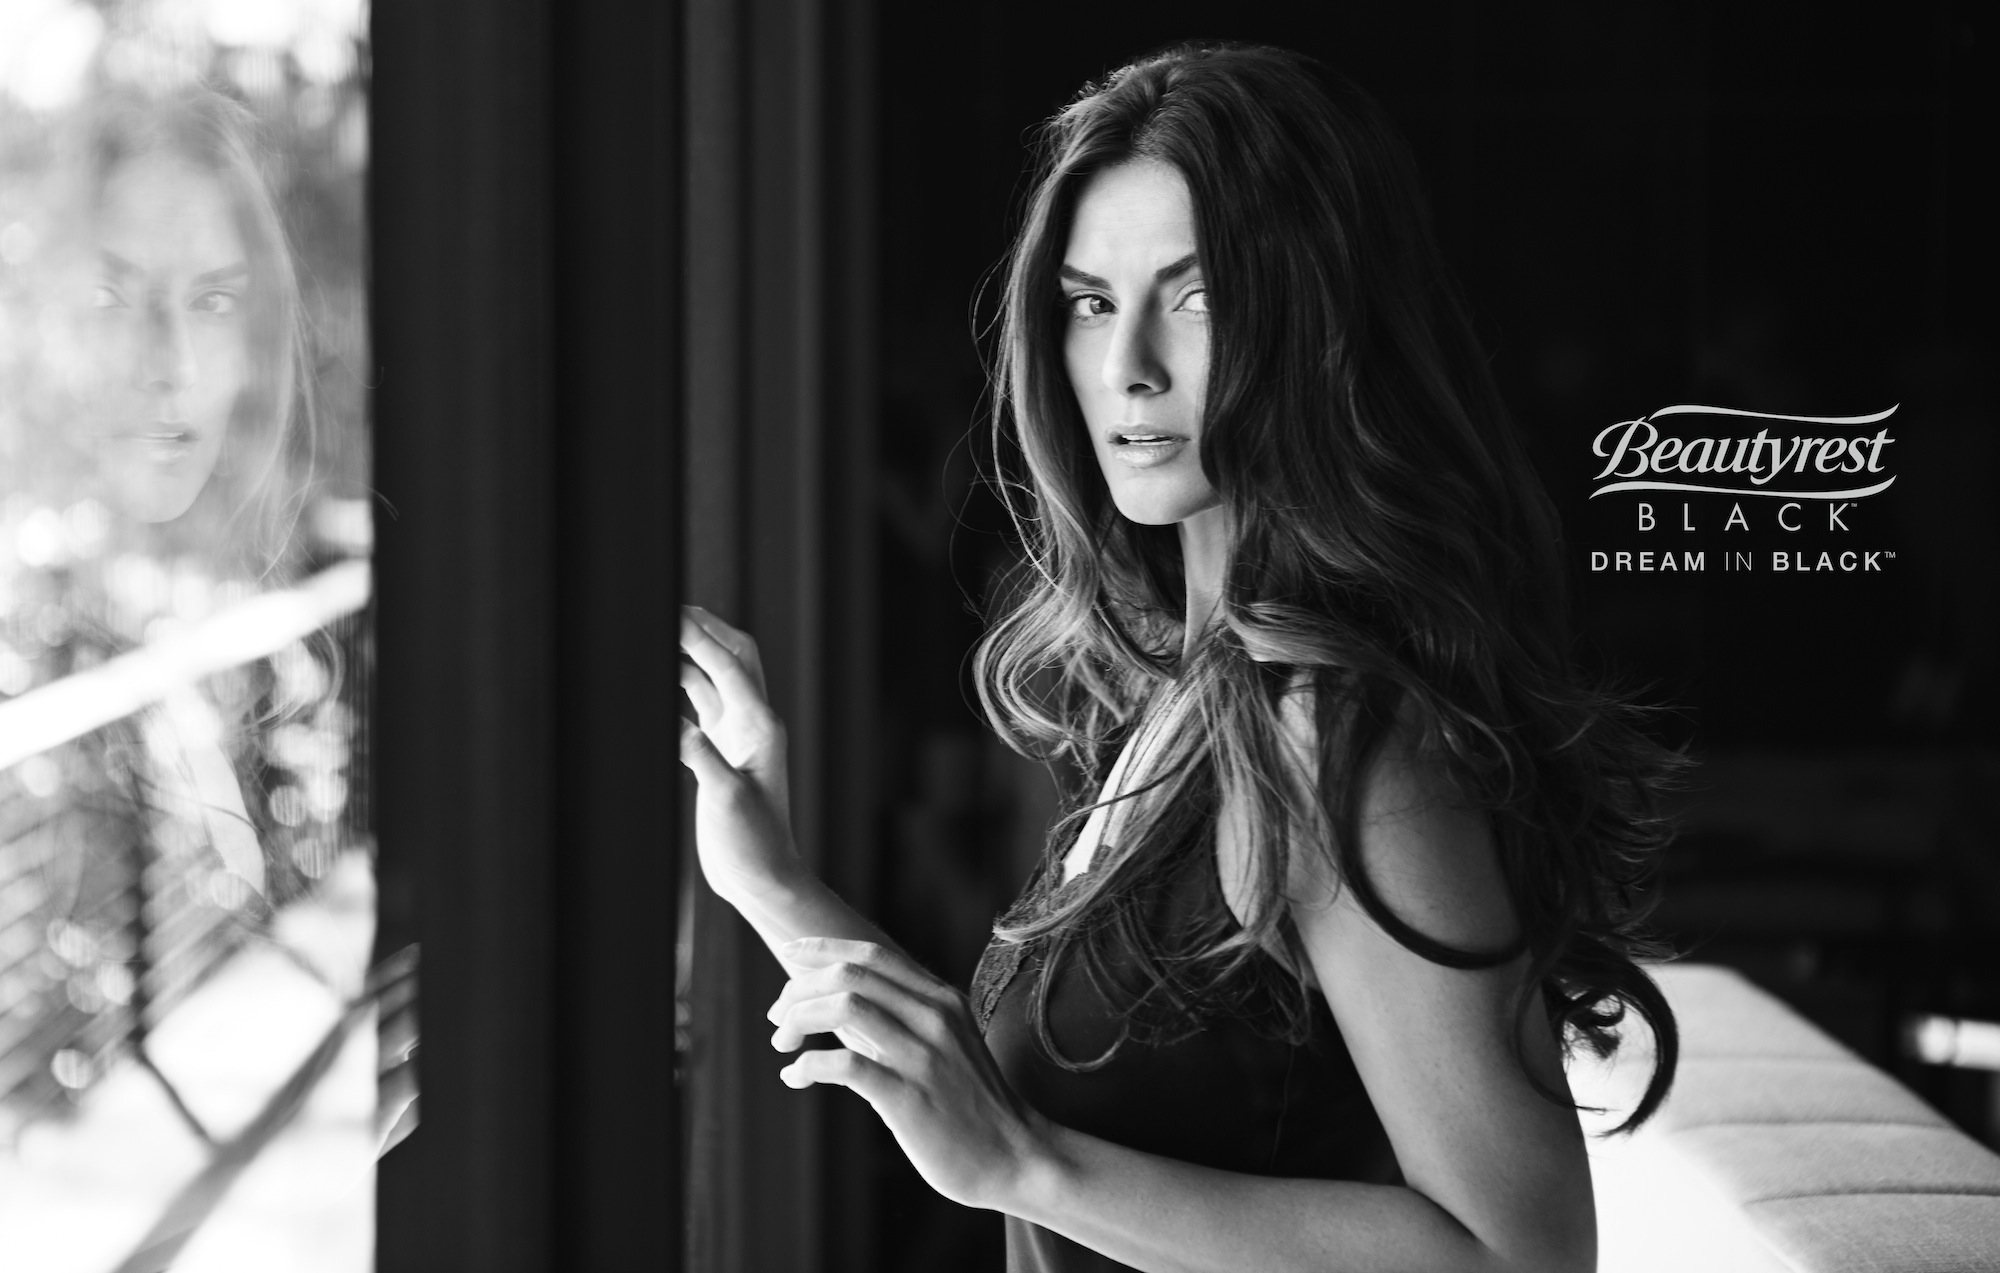 Steven Lippman shoots Simmons Beautyrest Black campaign in ...